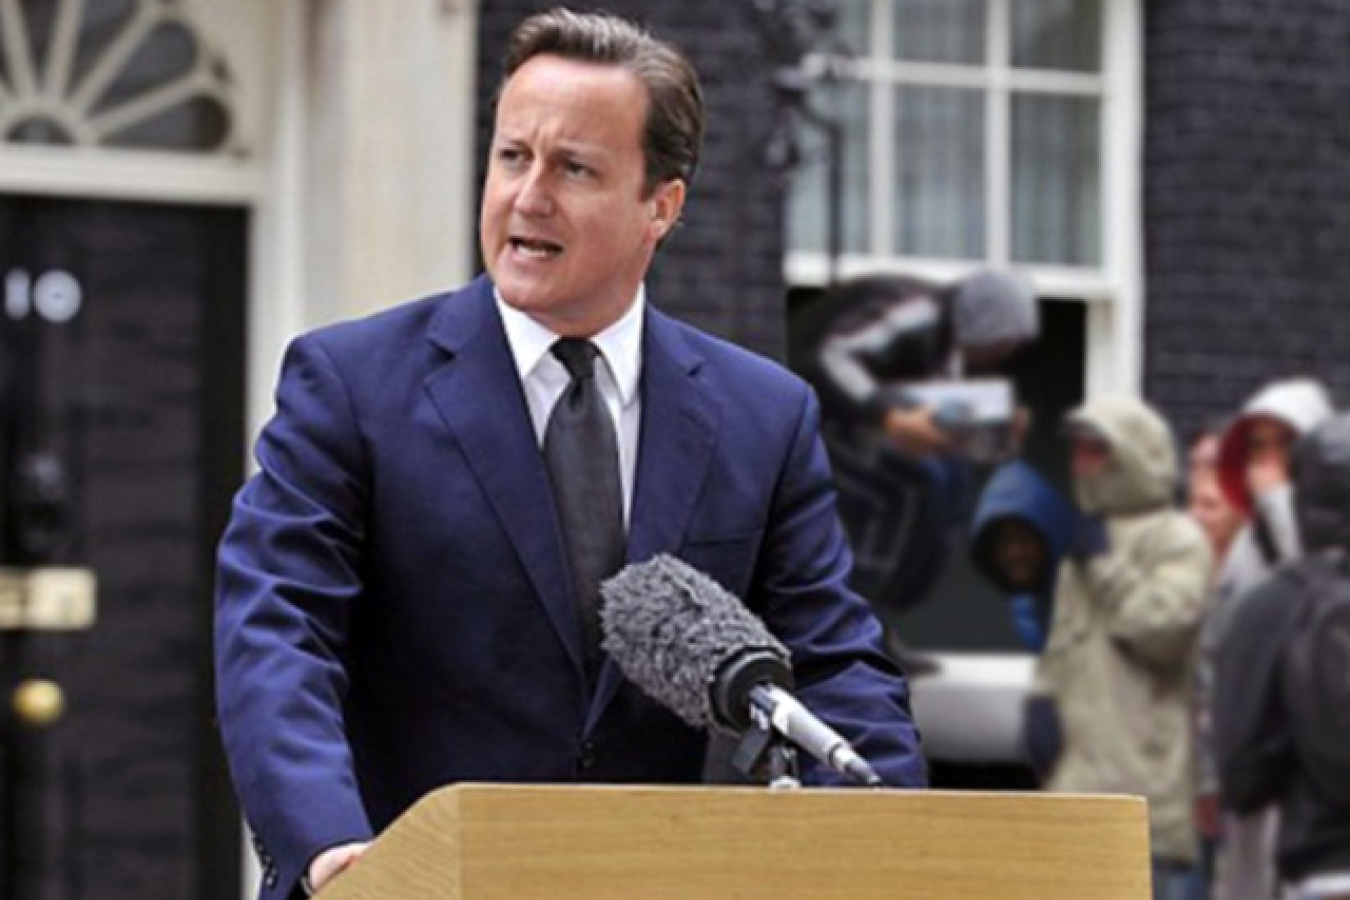 David Cameron former British Prime Minister